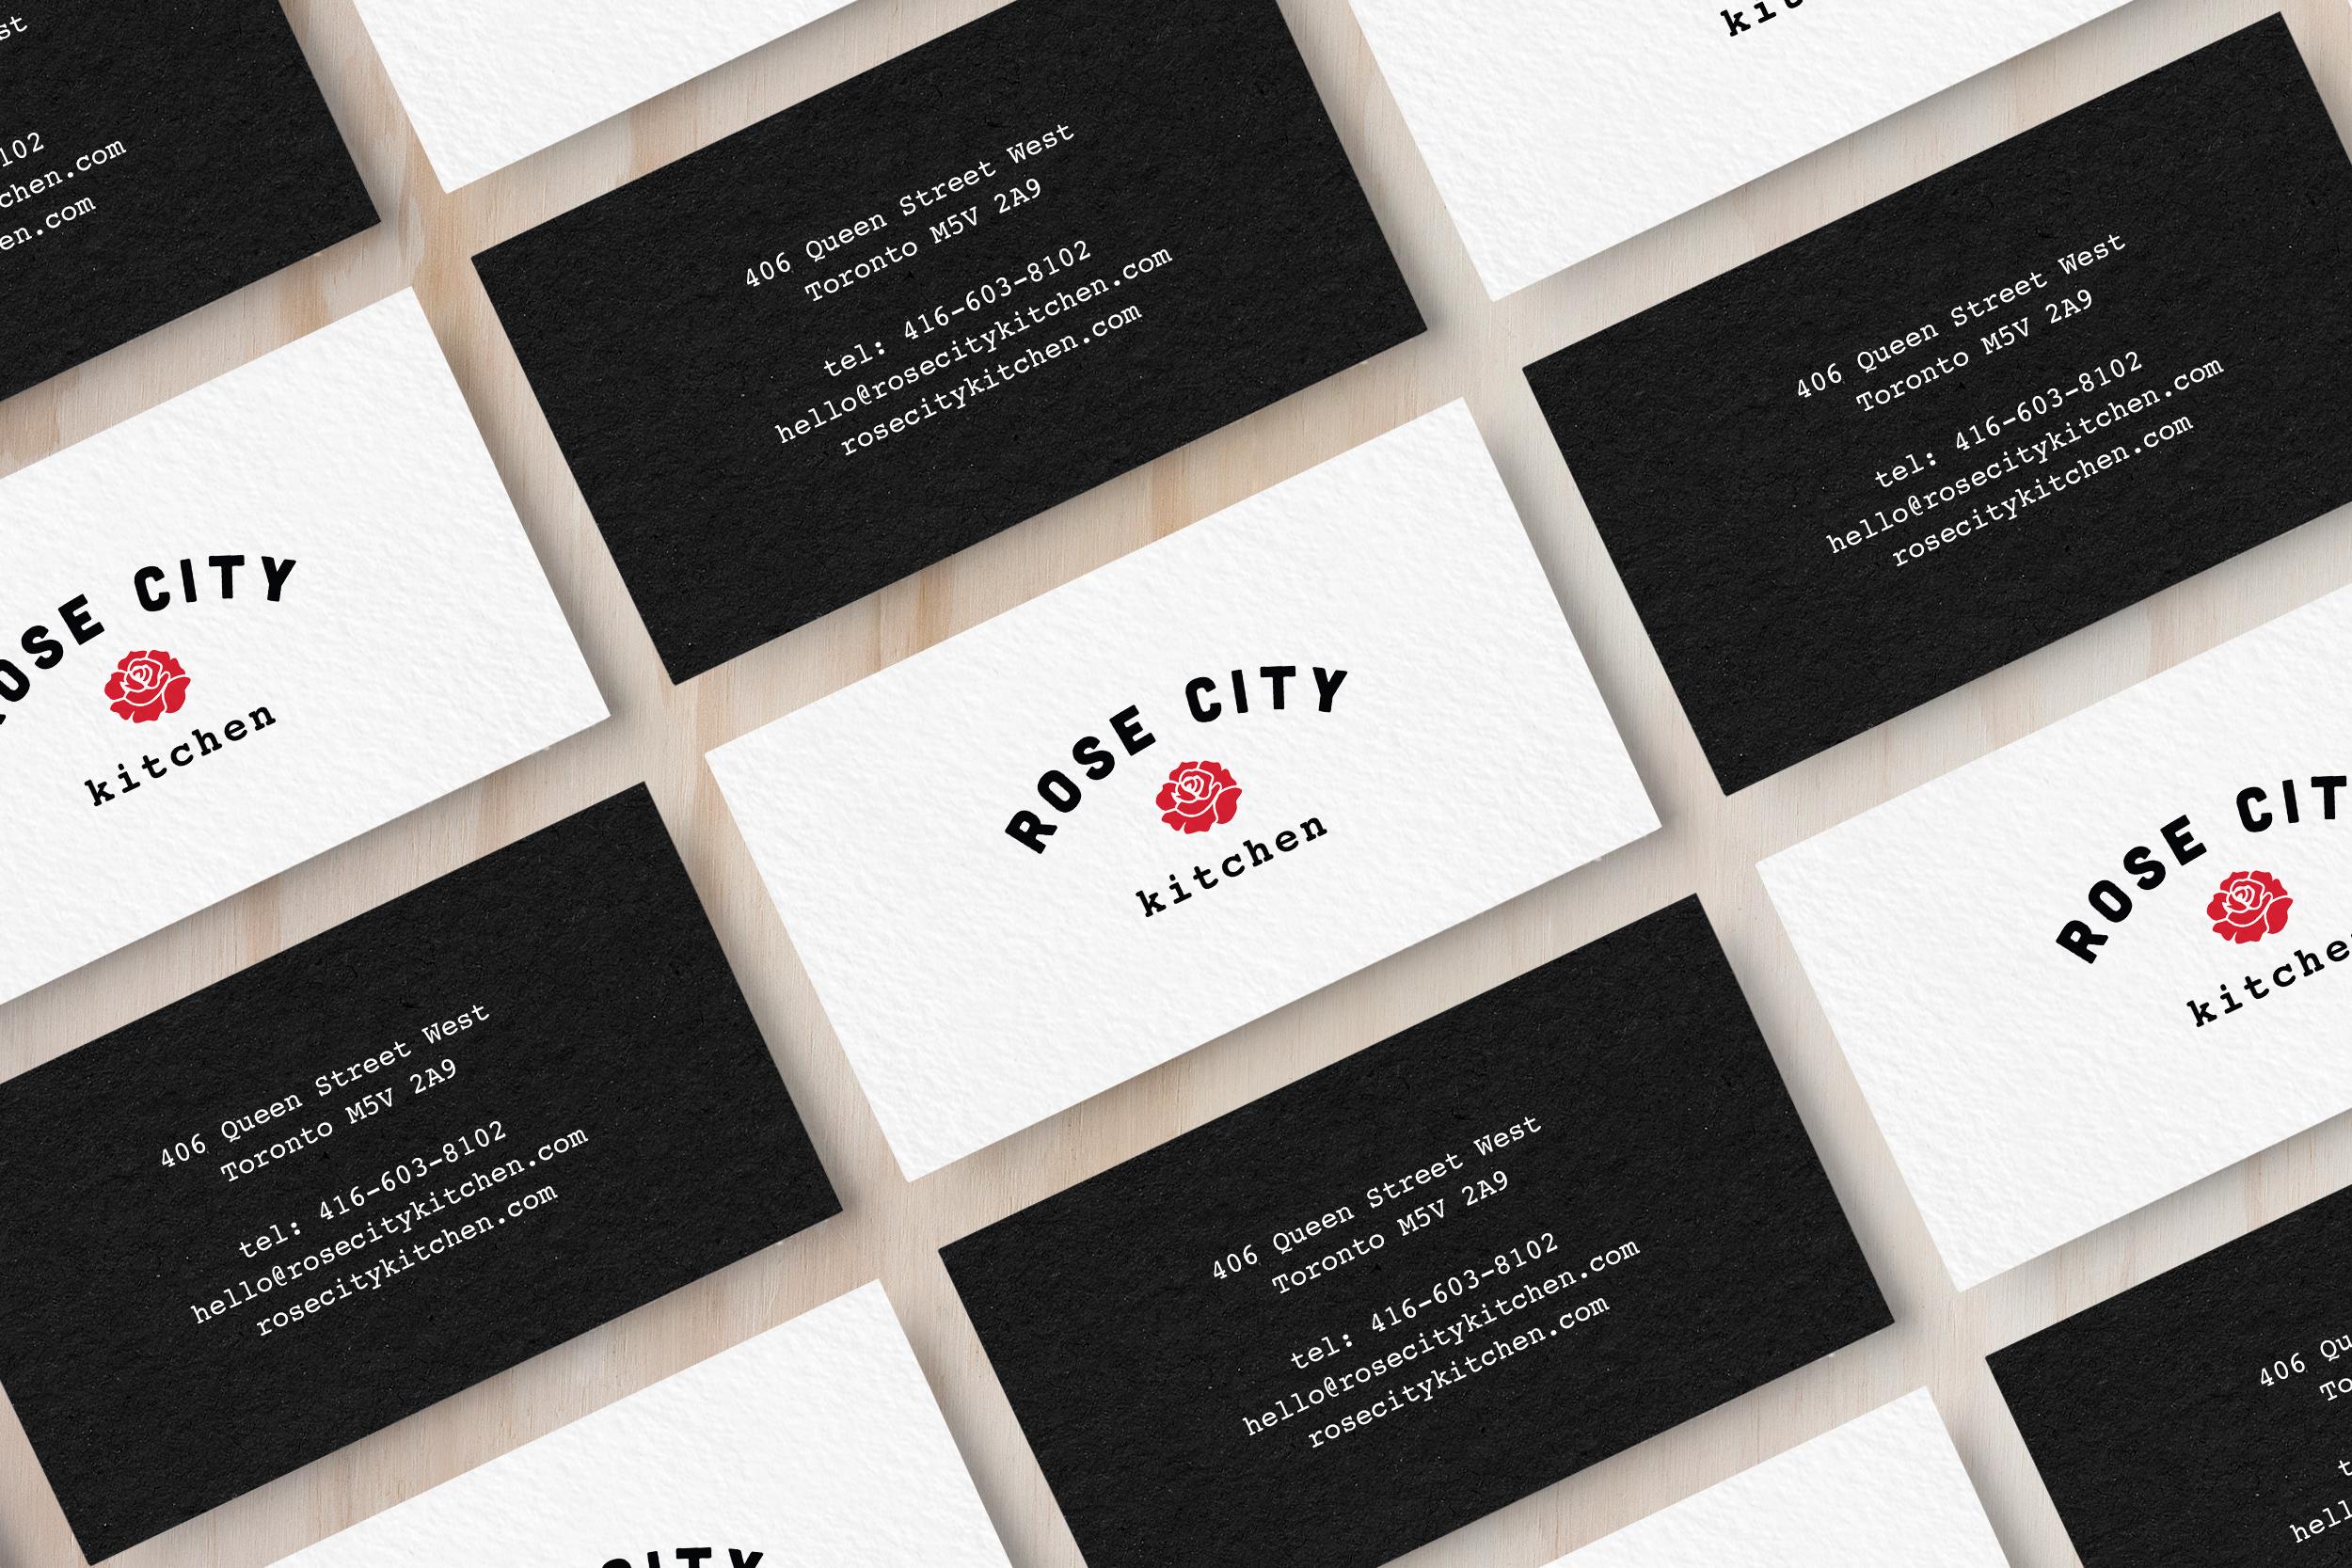 Rose City Kitchen — Michael Mavian